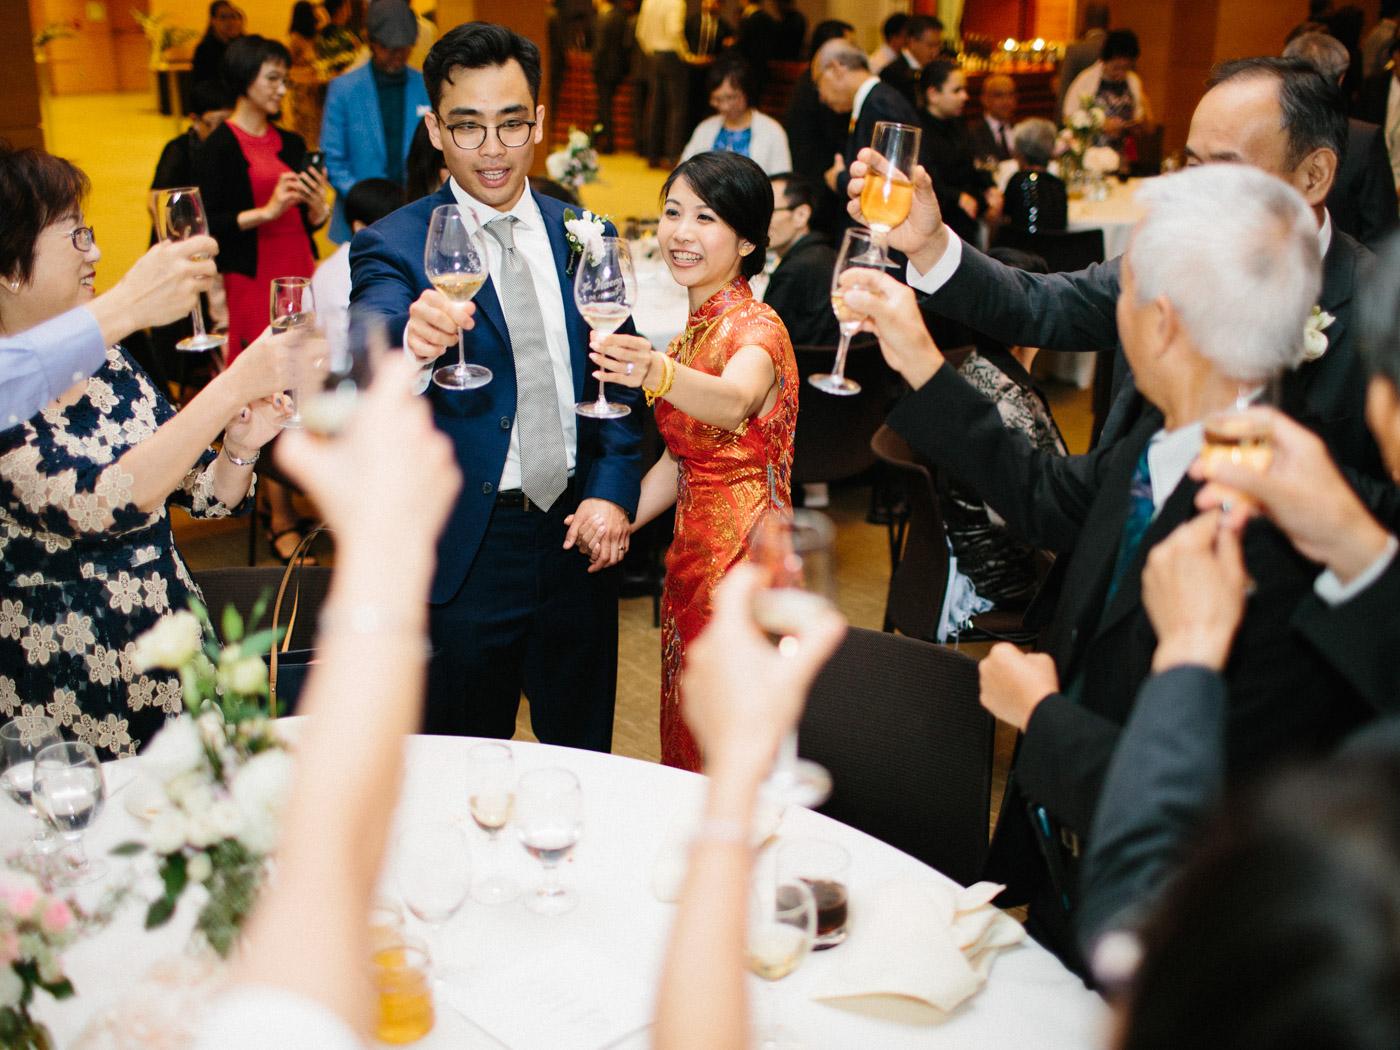 toronto_wedding_photographer_fine_art_documentary_photography-101.jpg